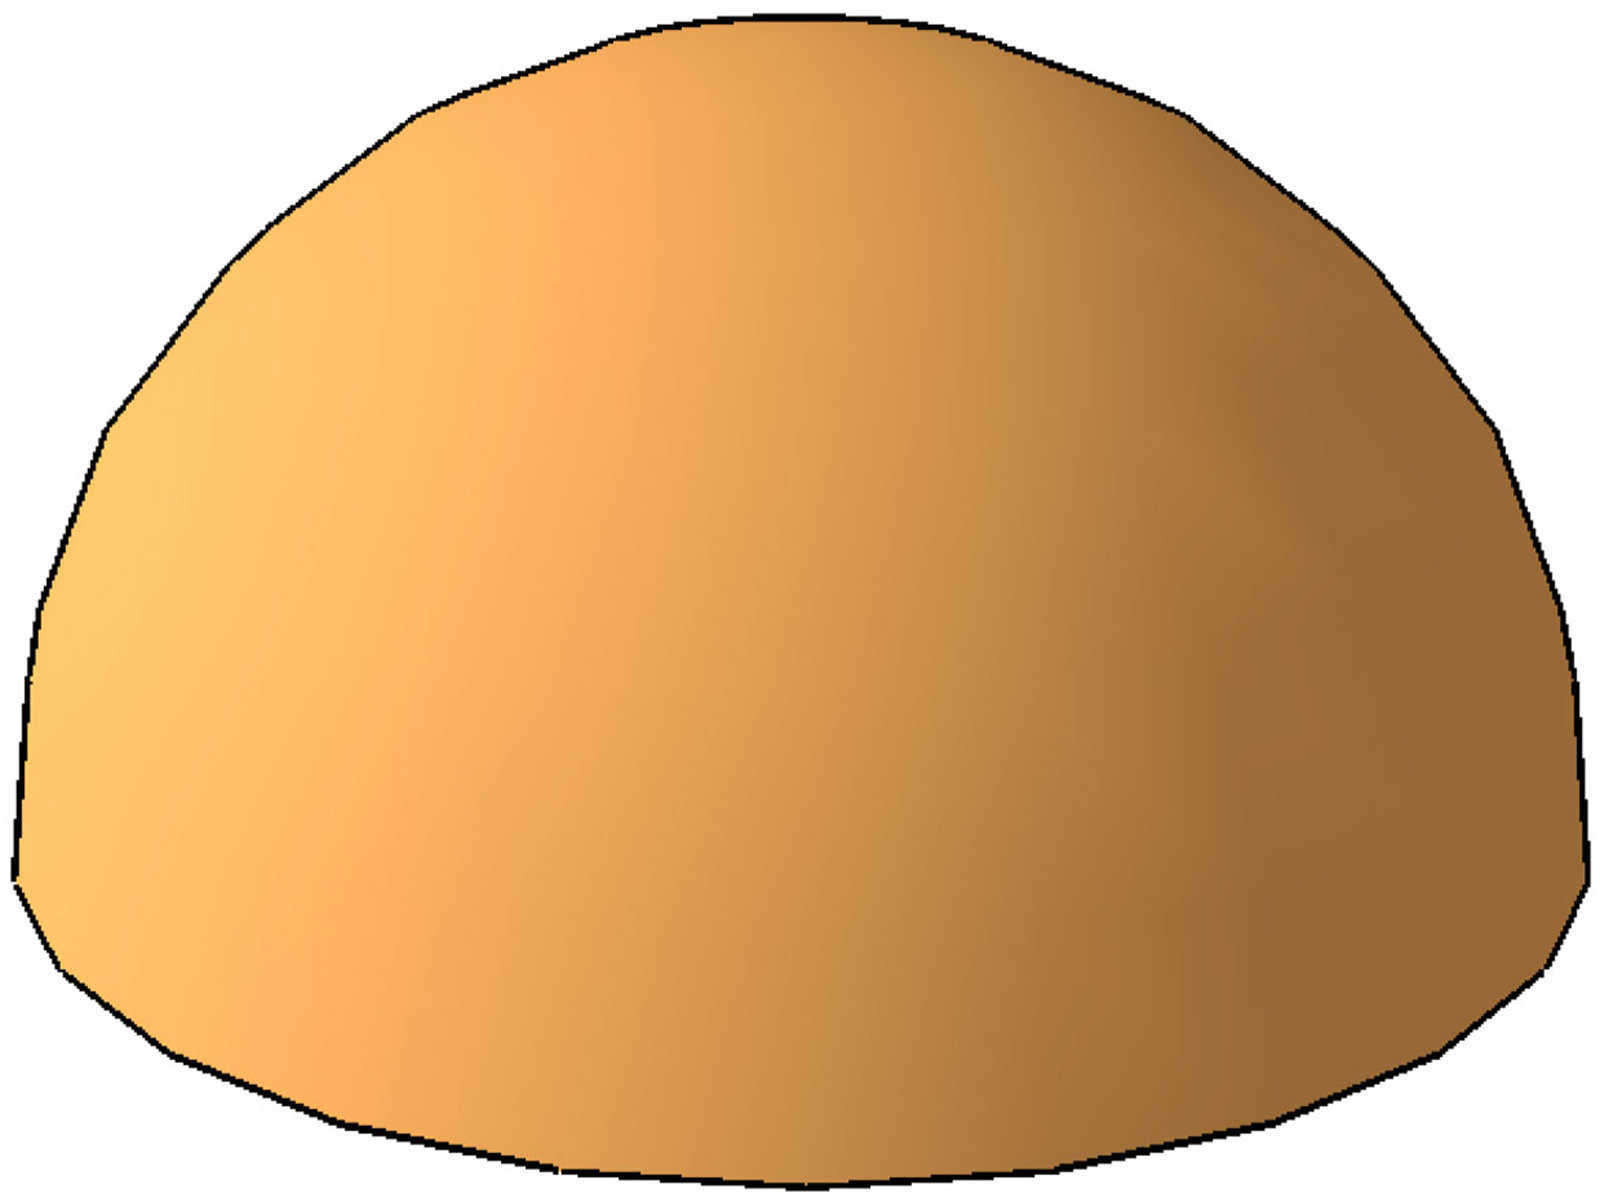 Dome clipart hemispherical #1